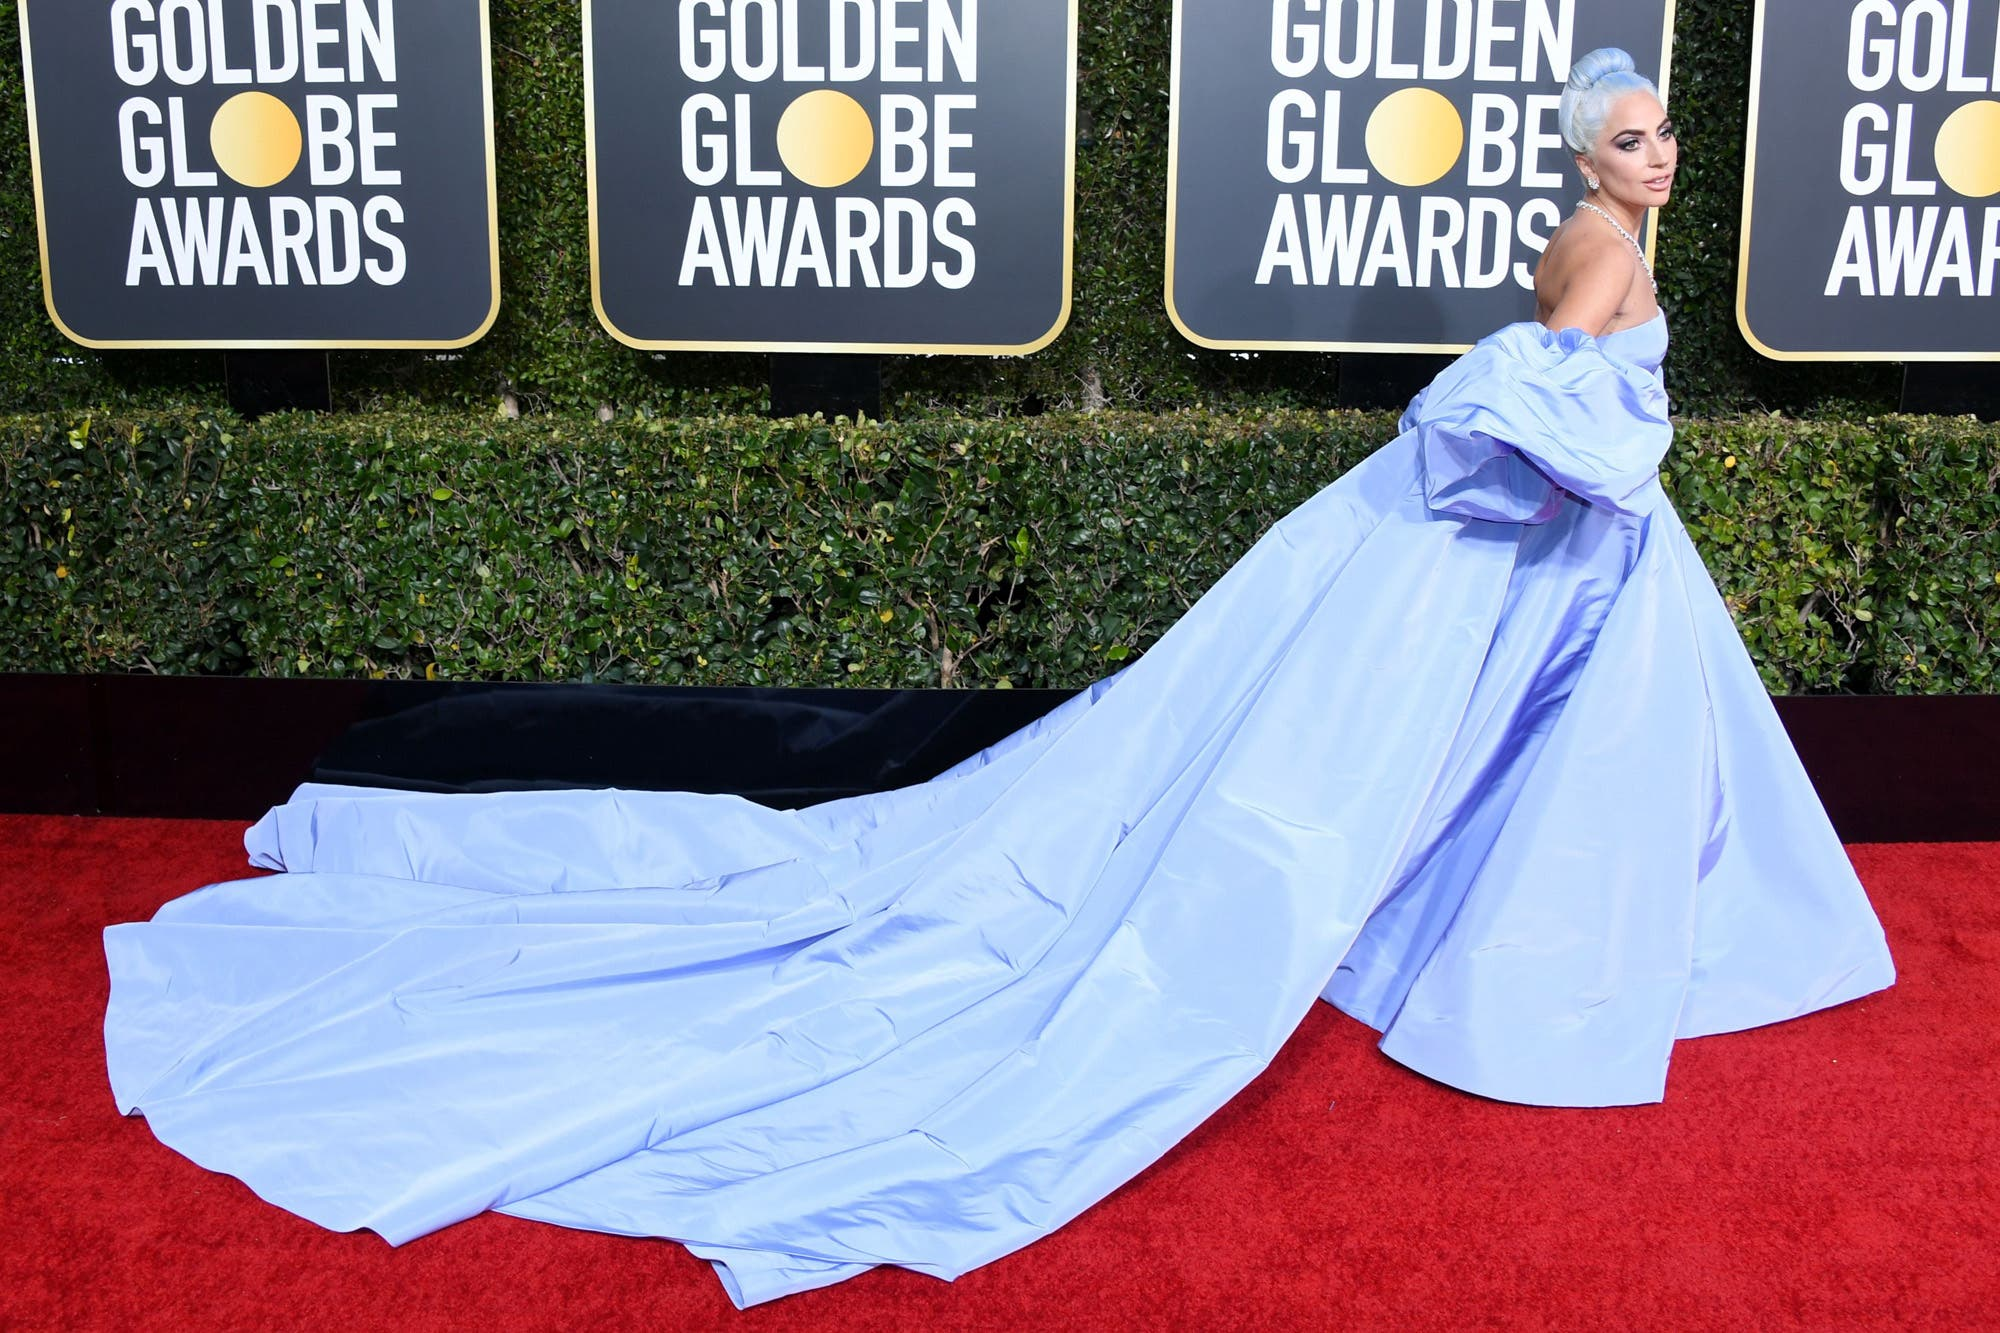 88e179741 Siete tendencias de moda que pisaron fuerte la alfombra roja de los Globo  de Oro - LA NACION